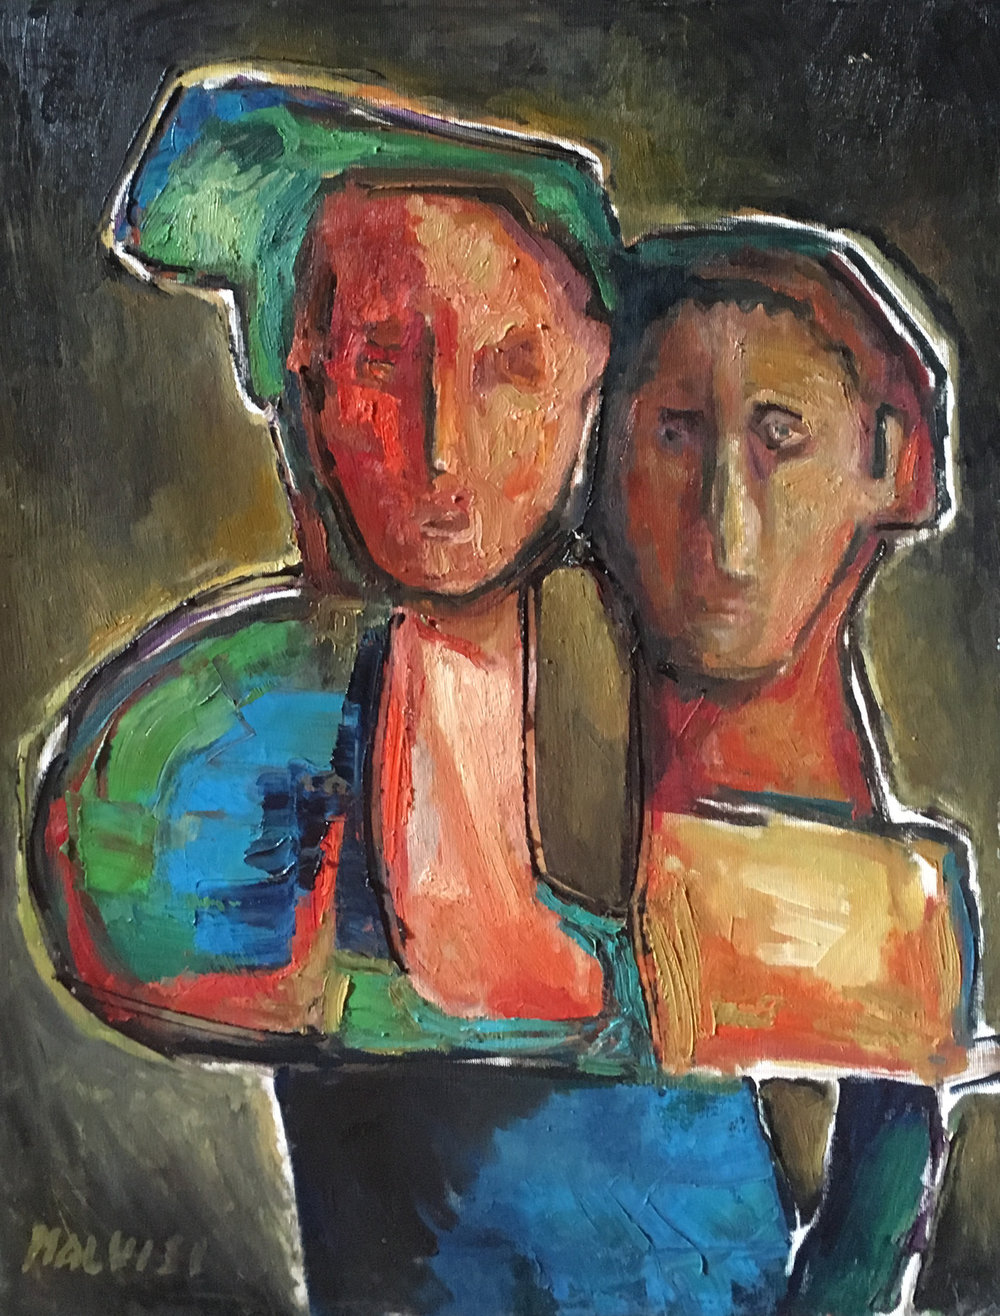 <b>Wonder or awe? </b><br>(Orig.Stupore o timore?) <br> 2001 Oil on wood <br> cm 50 x 70